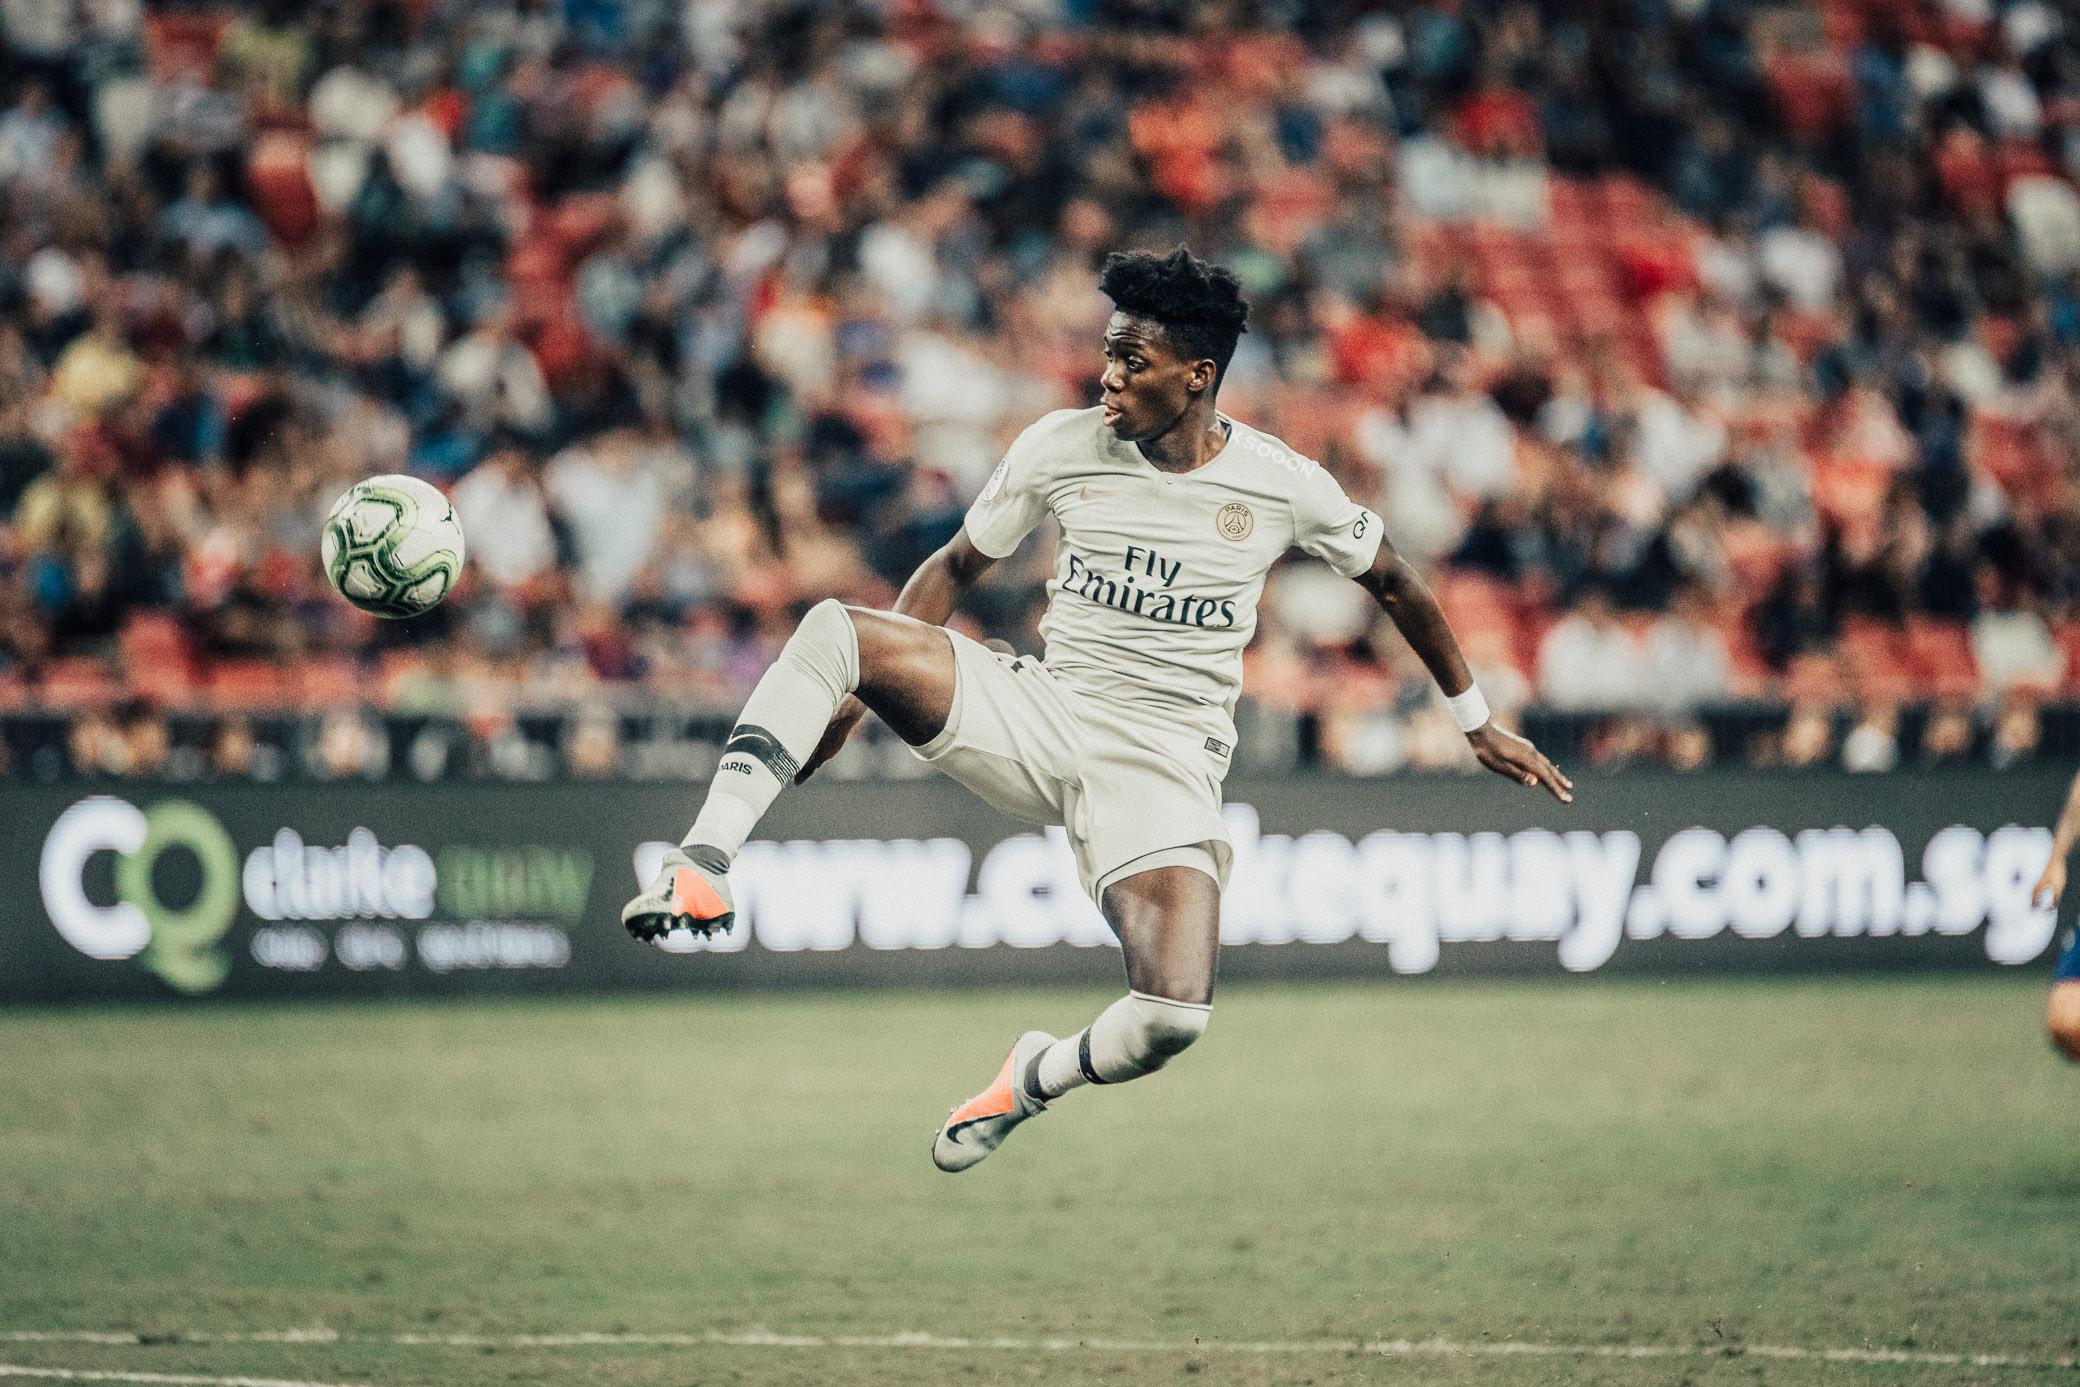 ICC 2018: PSG VS ATLETICO (TIMOTHY WEAH)